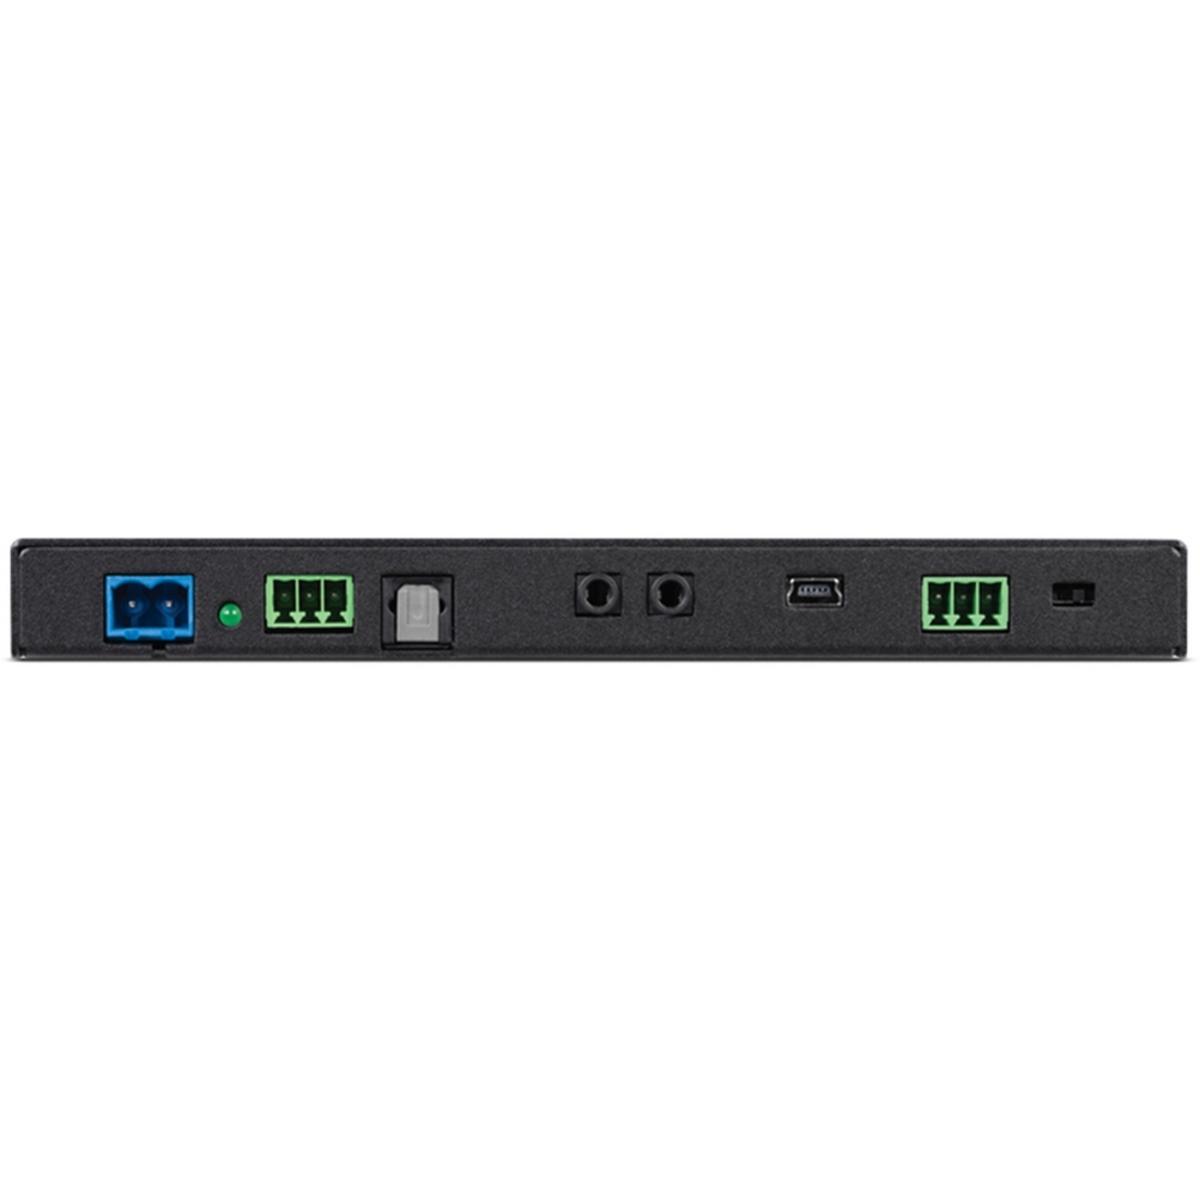 Buy Cyp Puv 1230pl Tx 60m Hdbaset Lite Slimline Transmitter Litetm